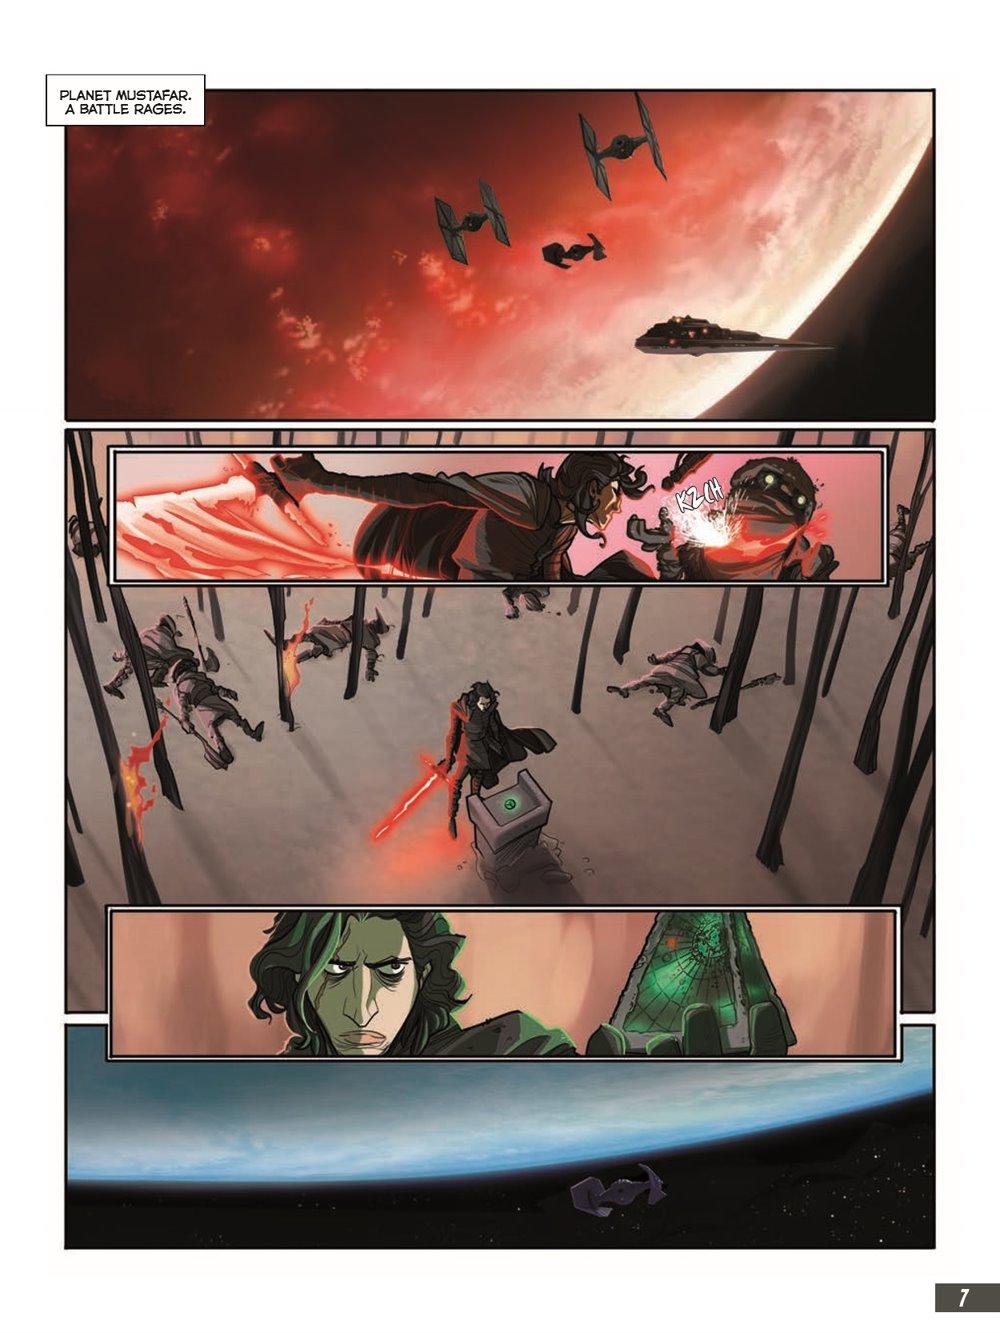 StarWars_IX_TheRiseOfSkywalker_pr-3 ComicList Previews: STAR WARS THE RISE OF SKYWALKER GN